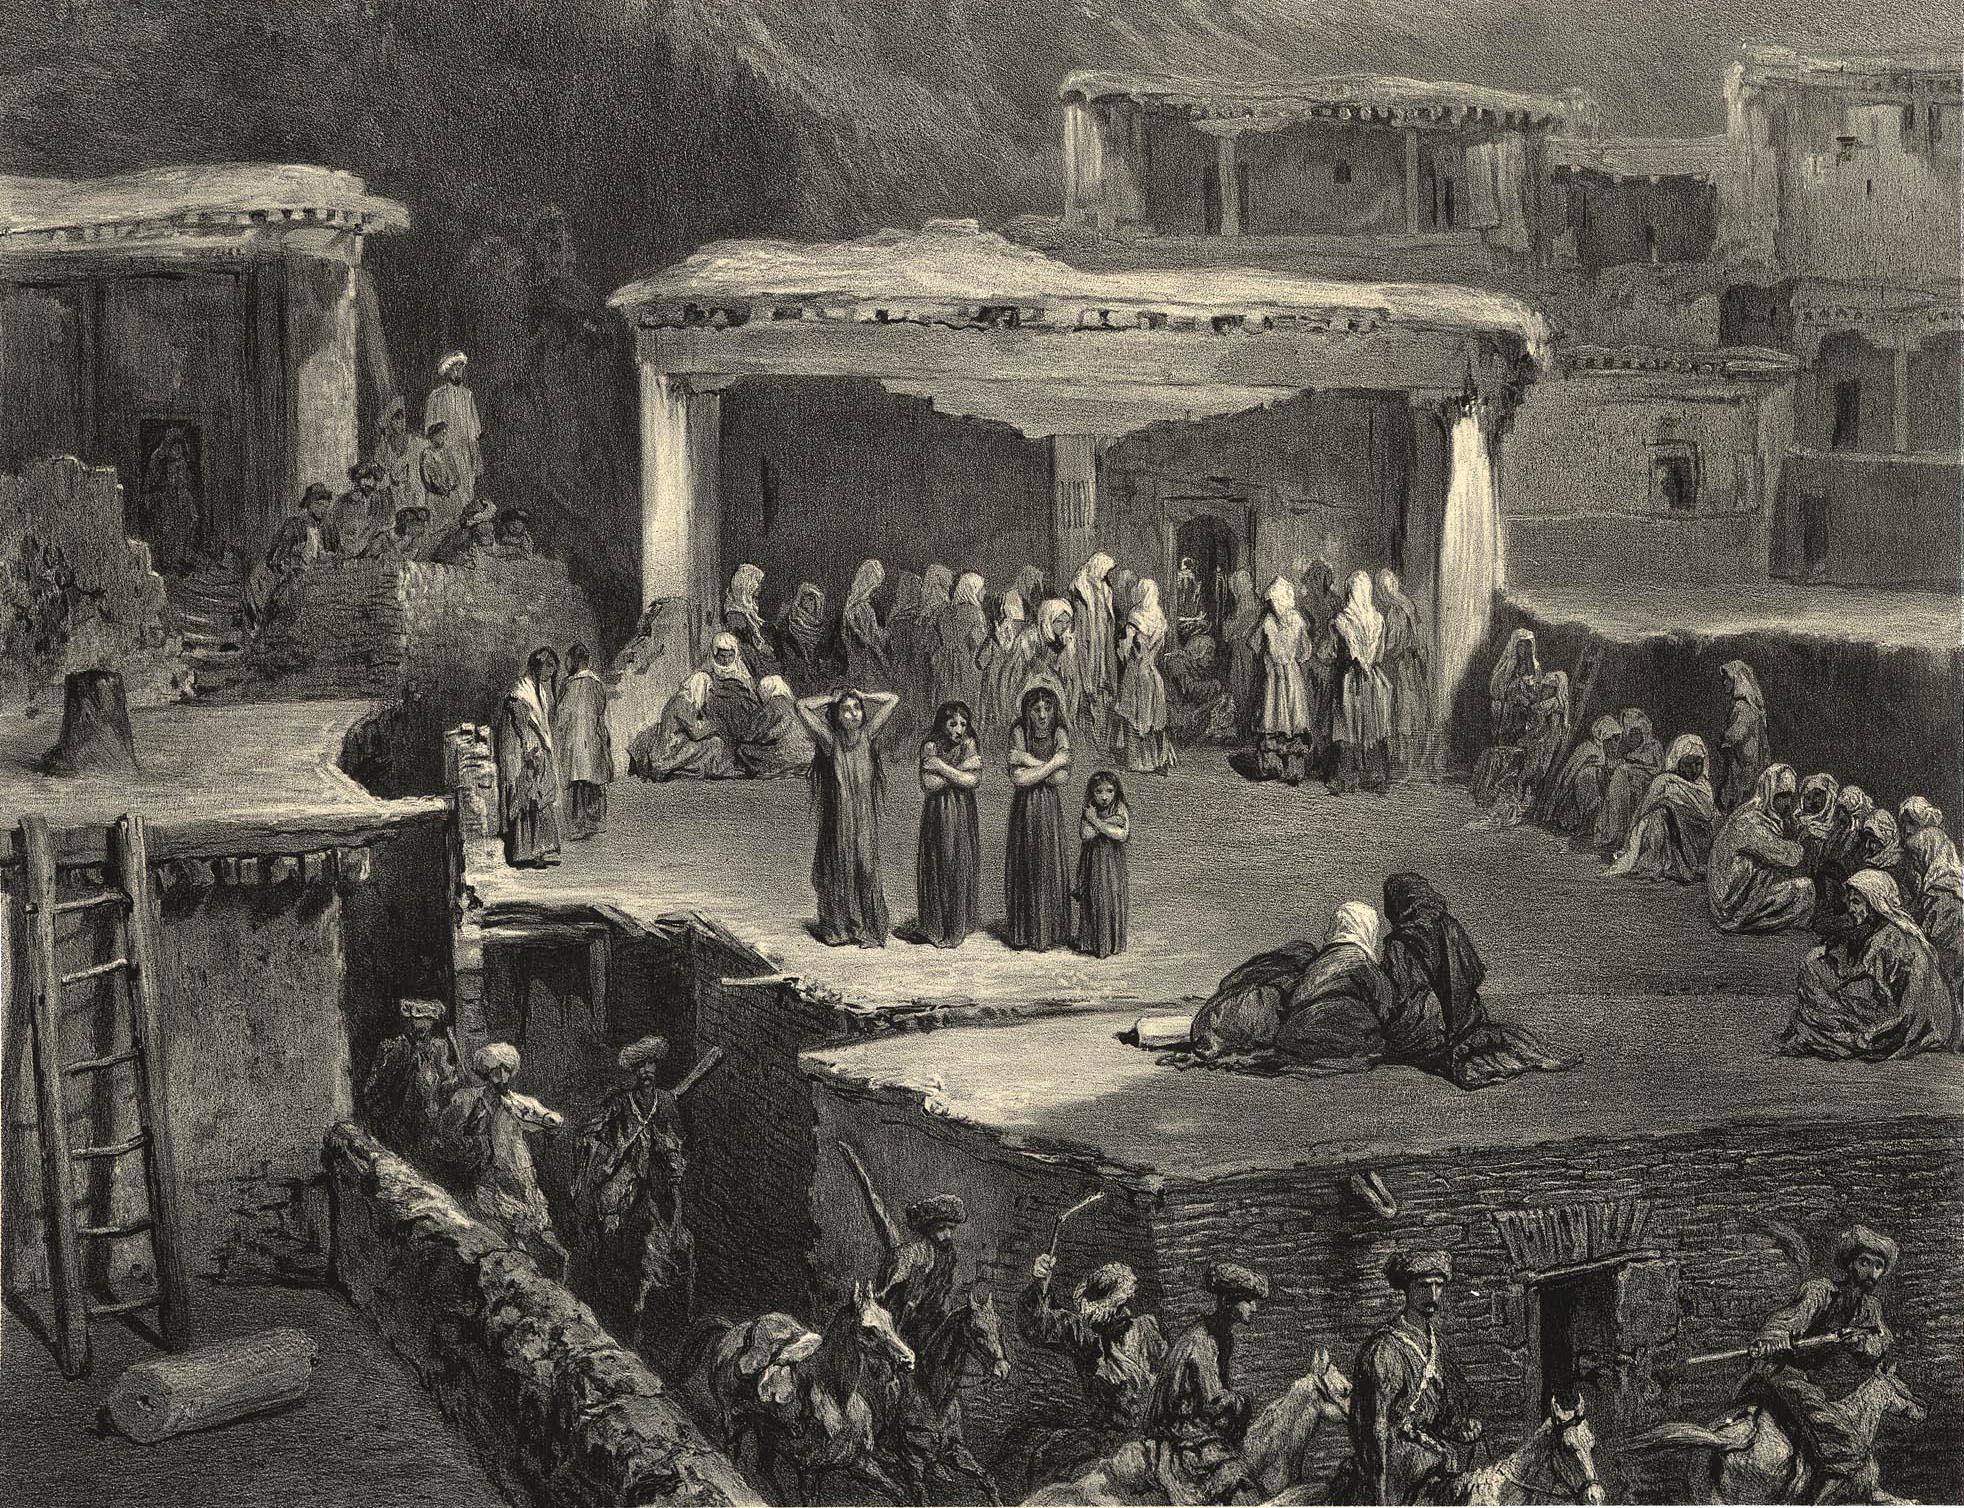 70. Daghestan. Ceremonie funebre a Akhaltchi (en Avarie) / Дагестан. Погребальная церемония в Ахальчи (в Аварии)